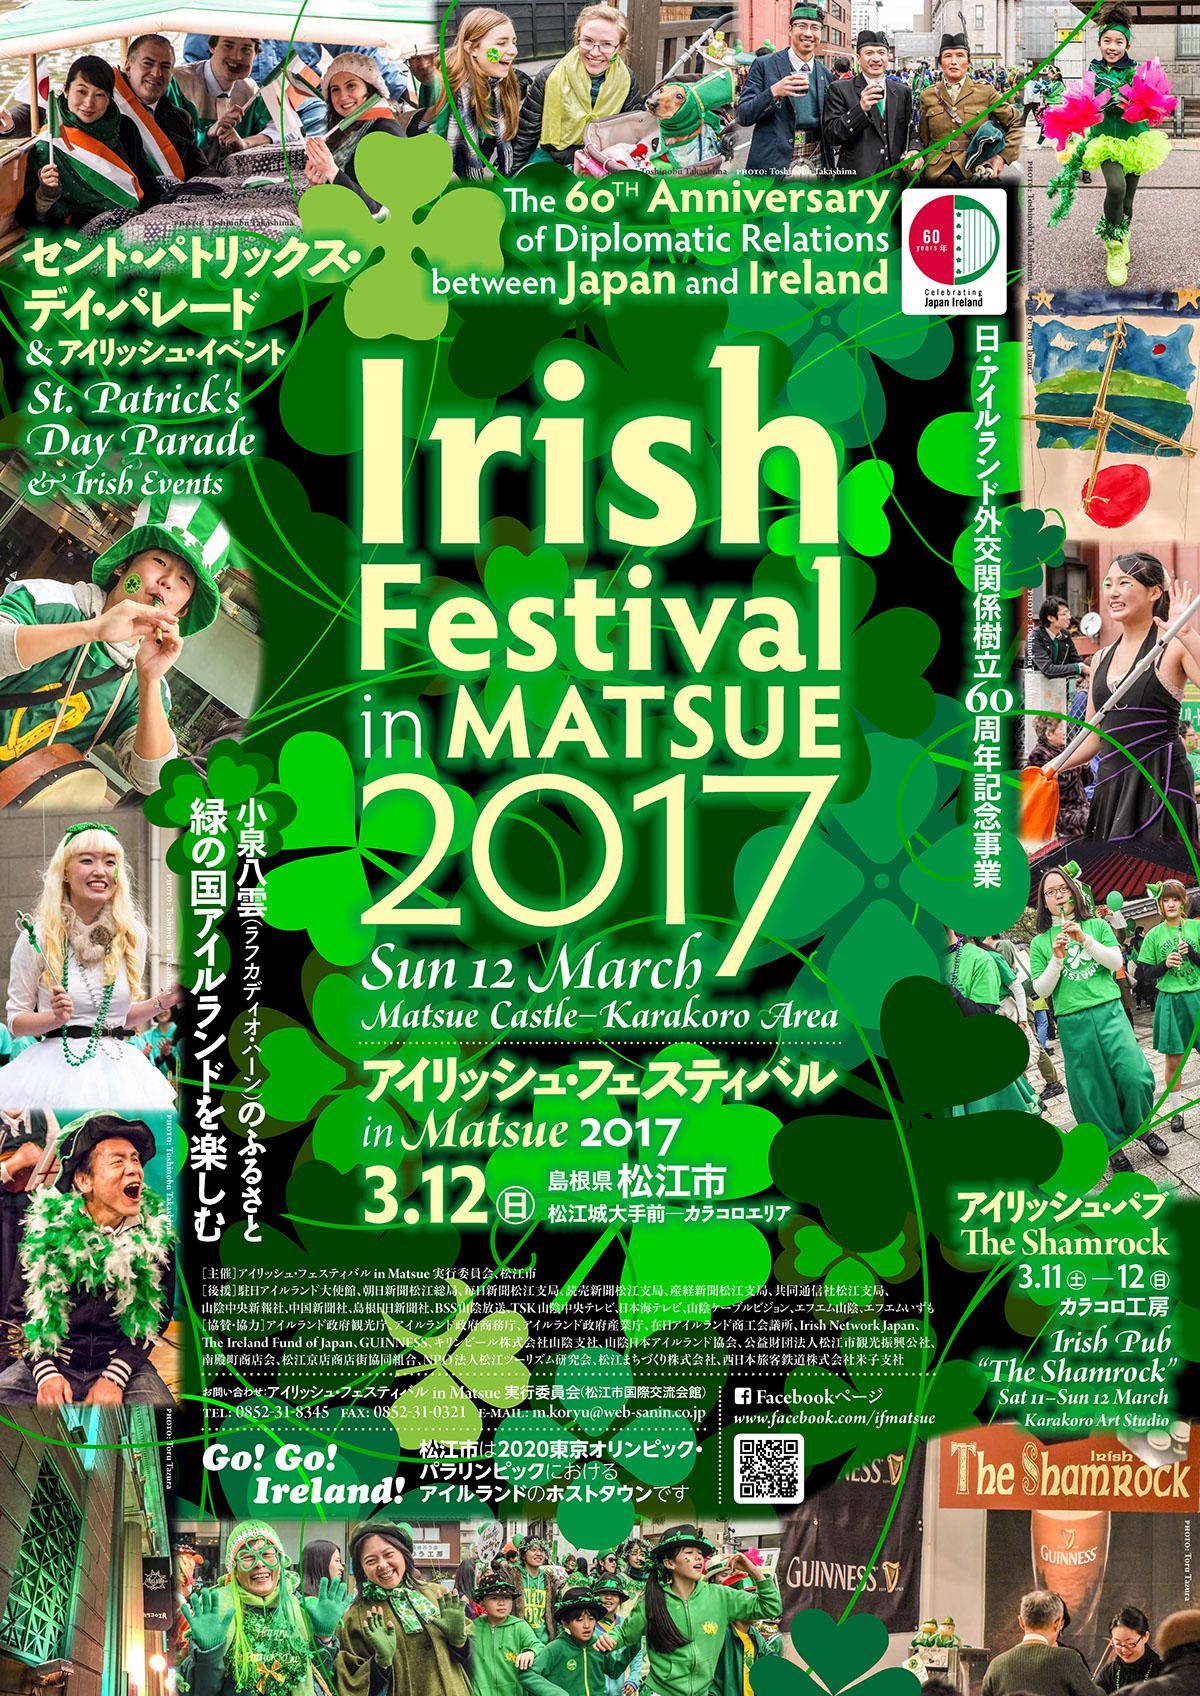 Adobe Portfolio Ireland st patrick's day matsue 石川陽春 Ishikawa Kiyoharu 松江 アイルランド セント・パトリックス・デイ・パレード